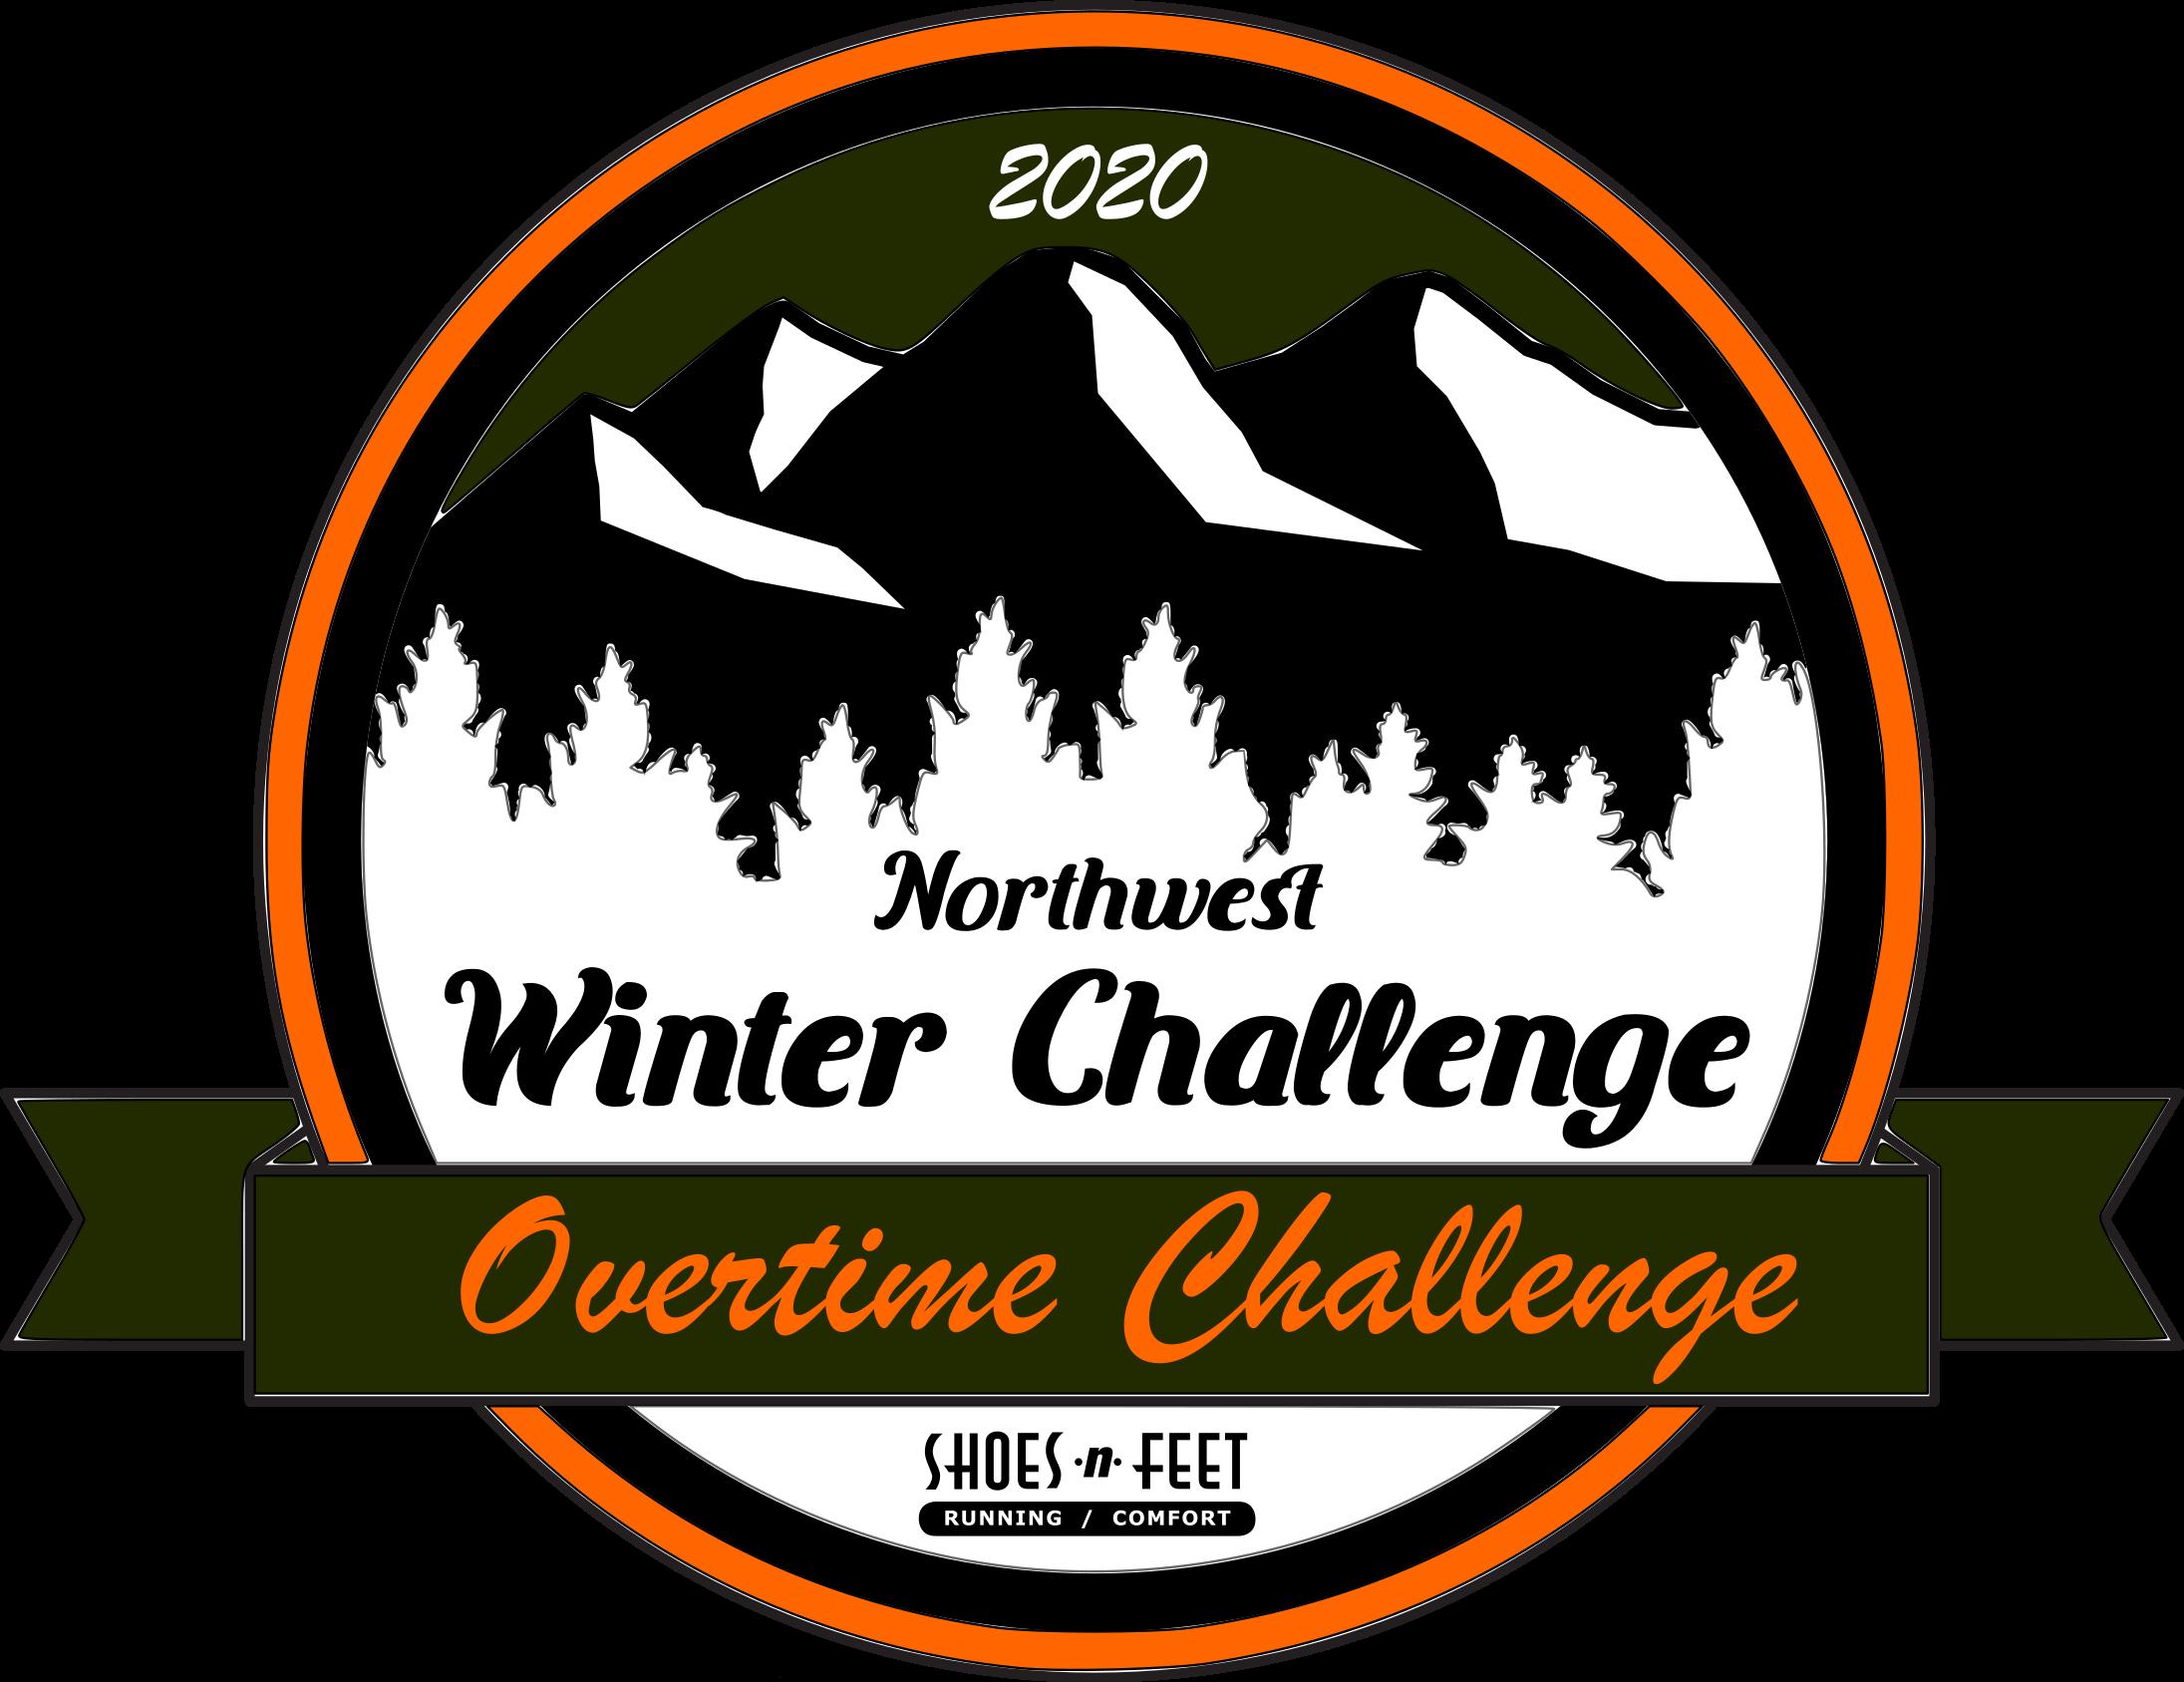 2020 overtime challenge logo